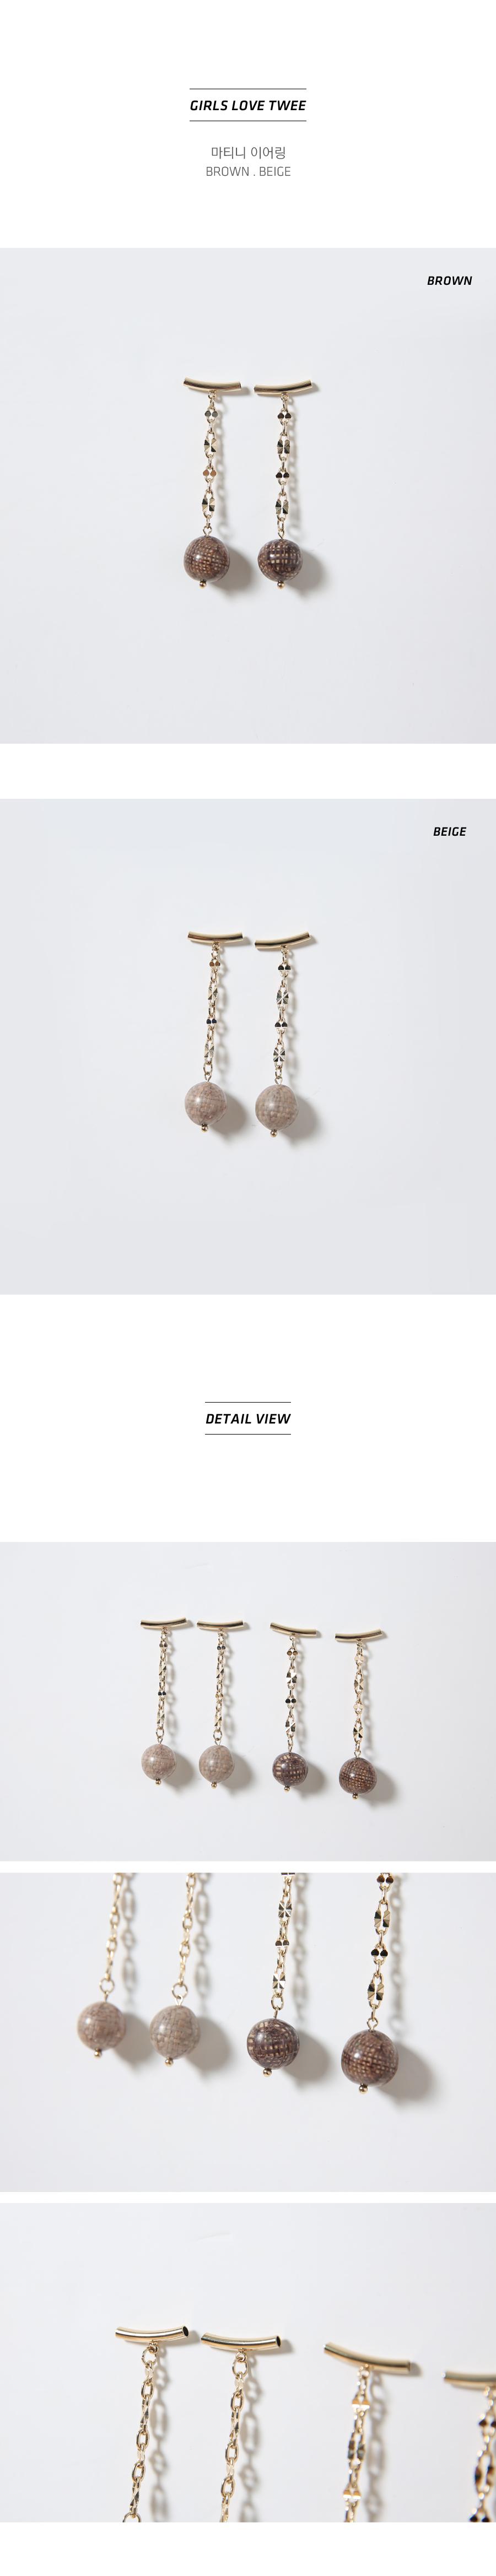 Martini earrings